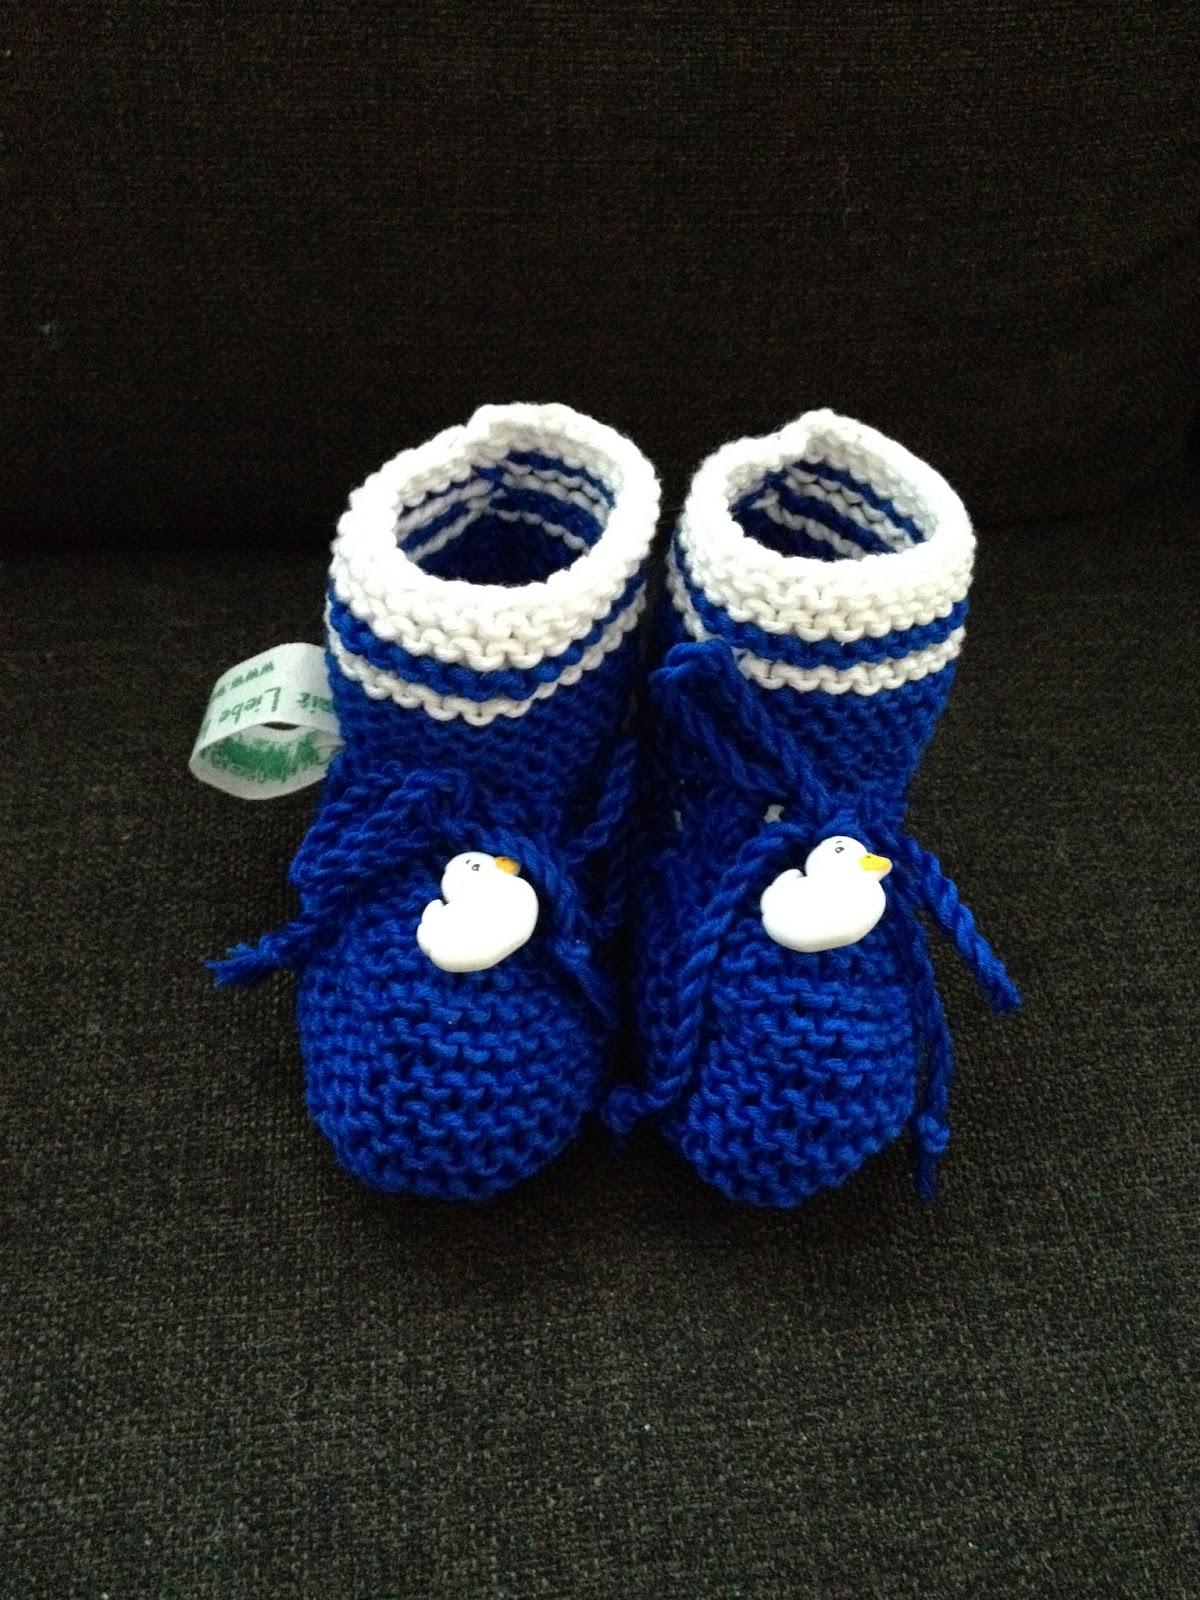 http://www.frauenklinik.kssg.ch/content/applikationen/babygallery/babygalerie_portal/2014/07/lars.babypopup.html